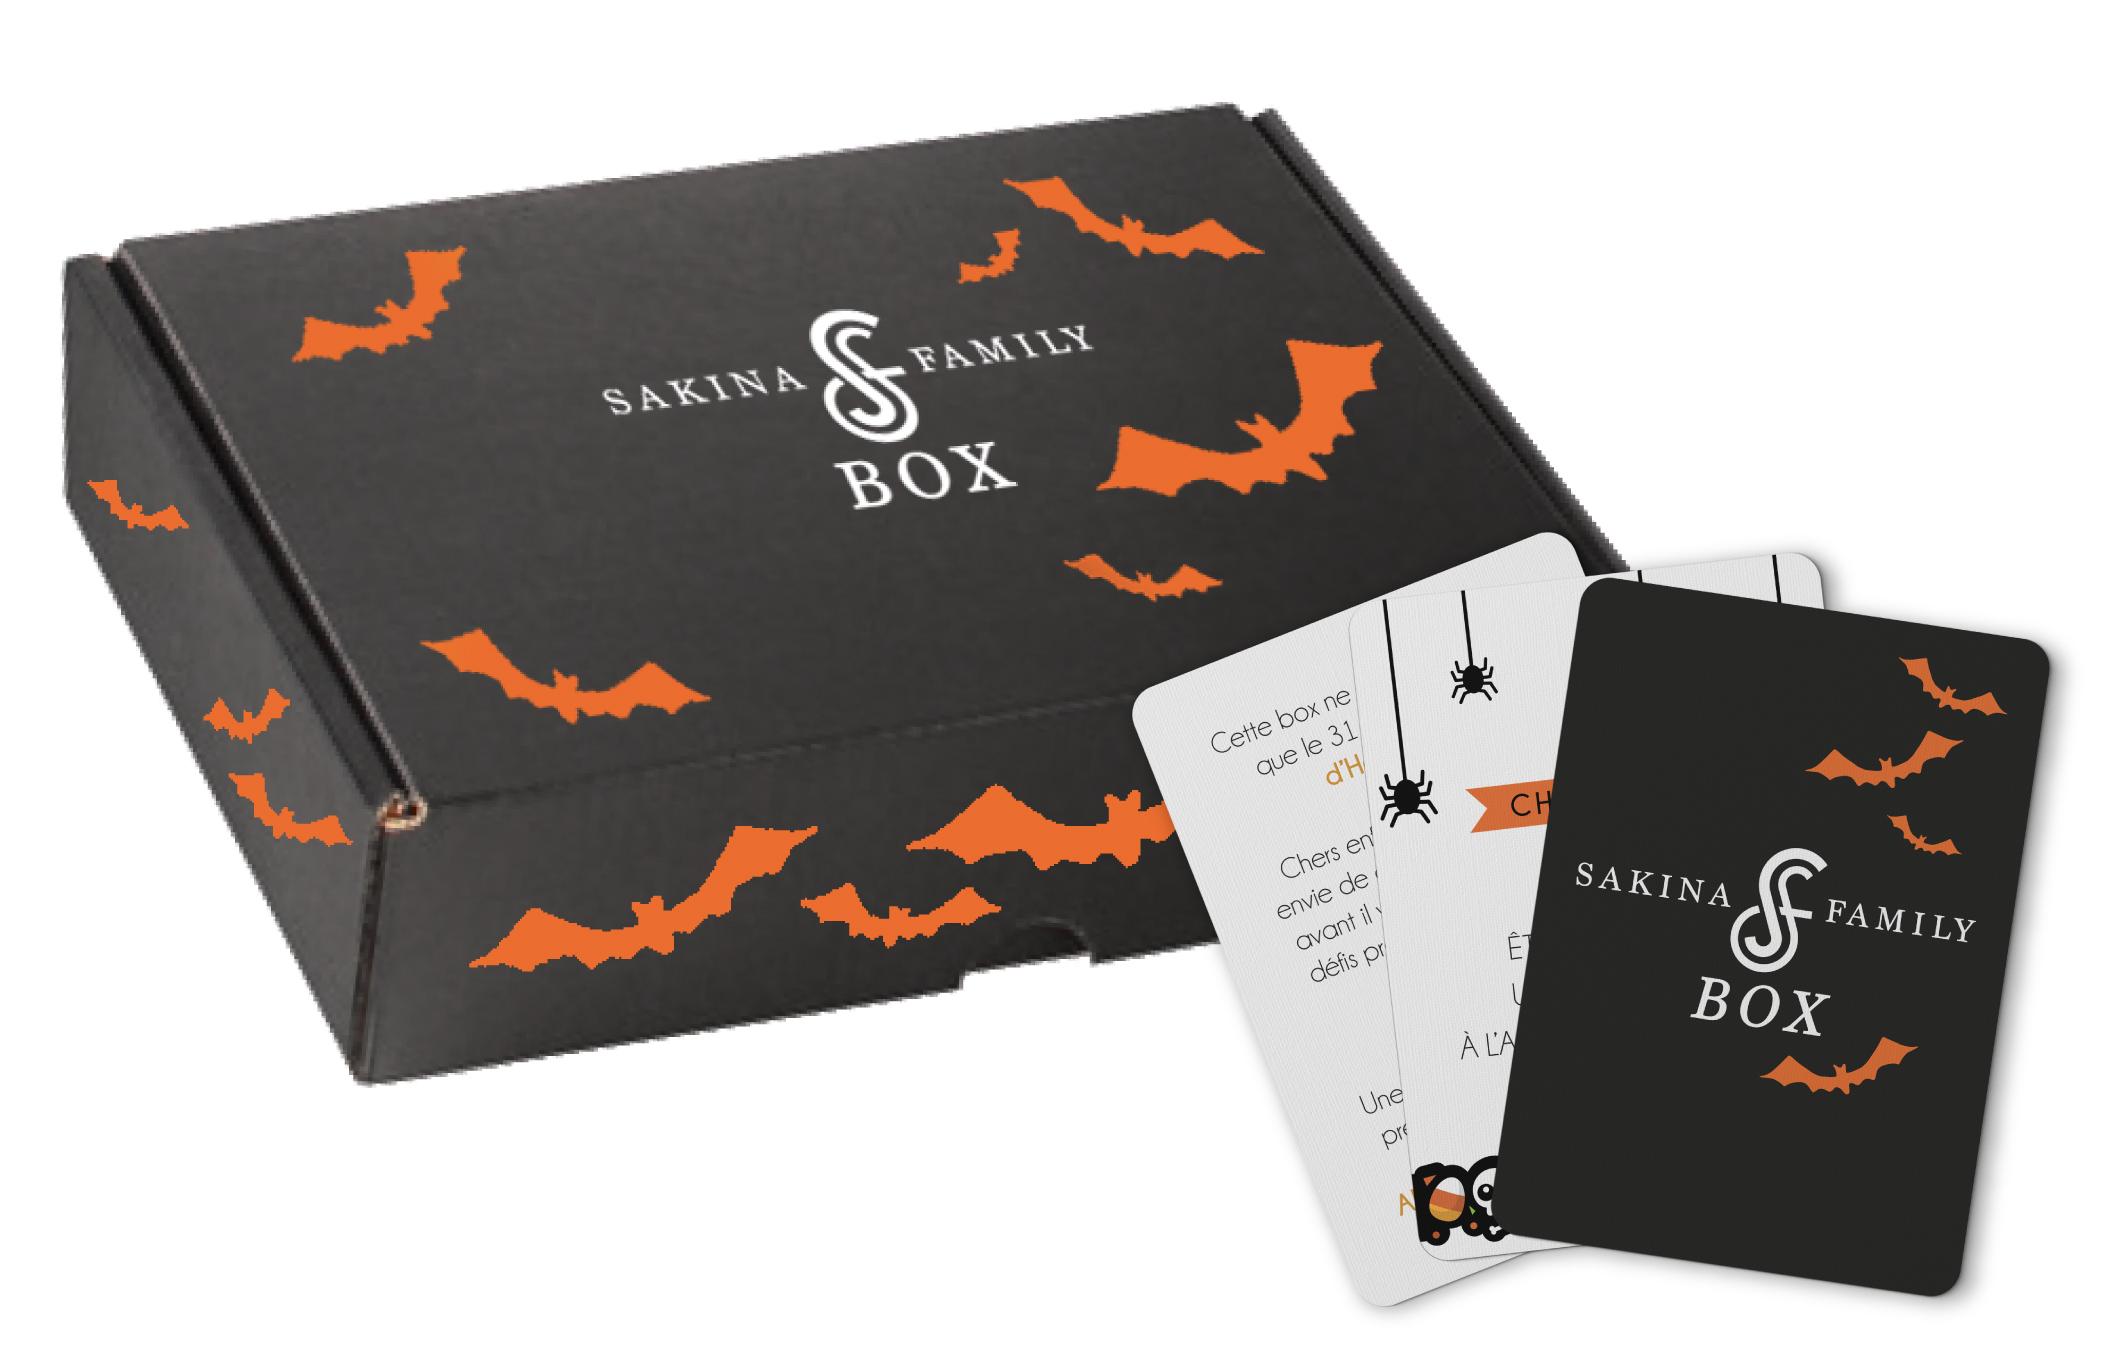 SAKINA-Box+Jeu_simu-01